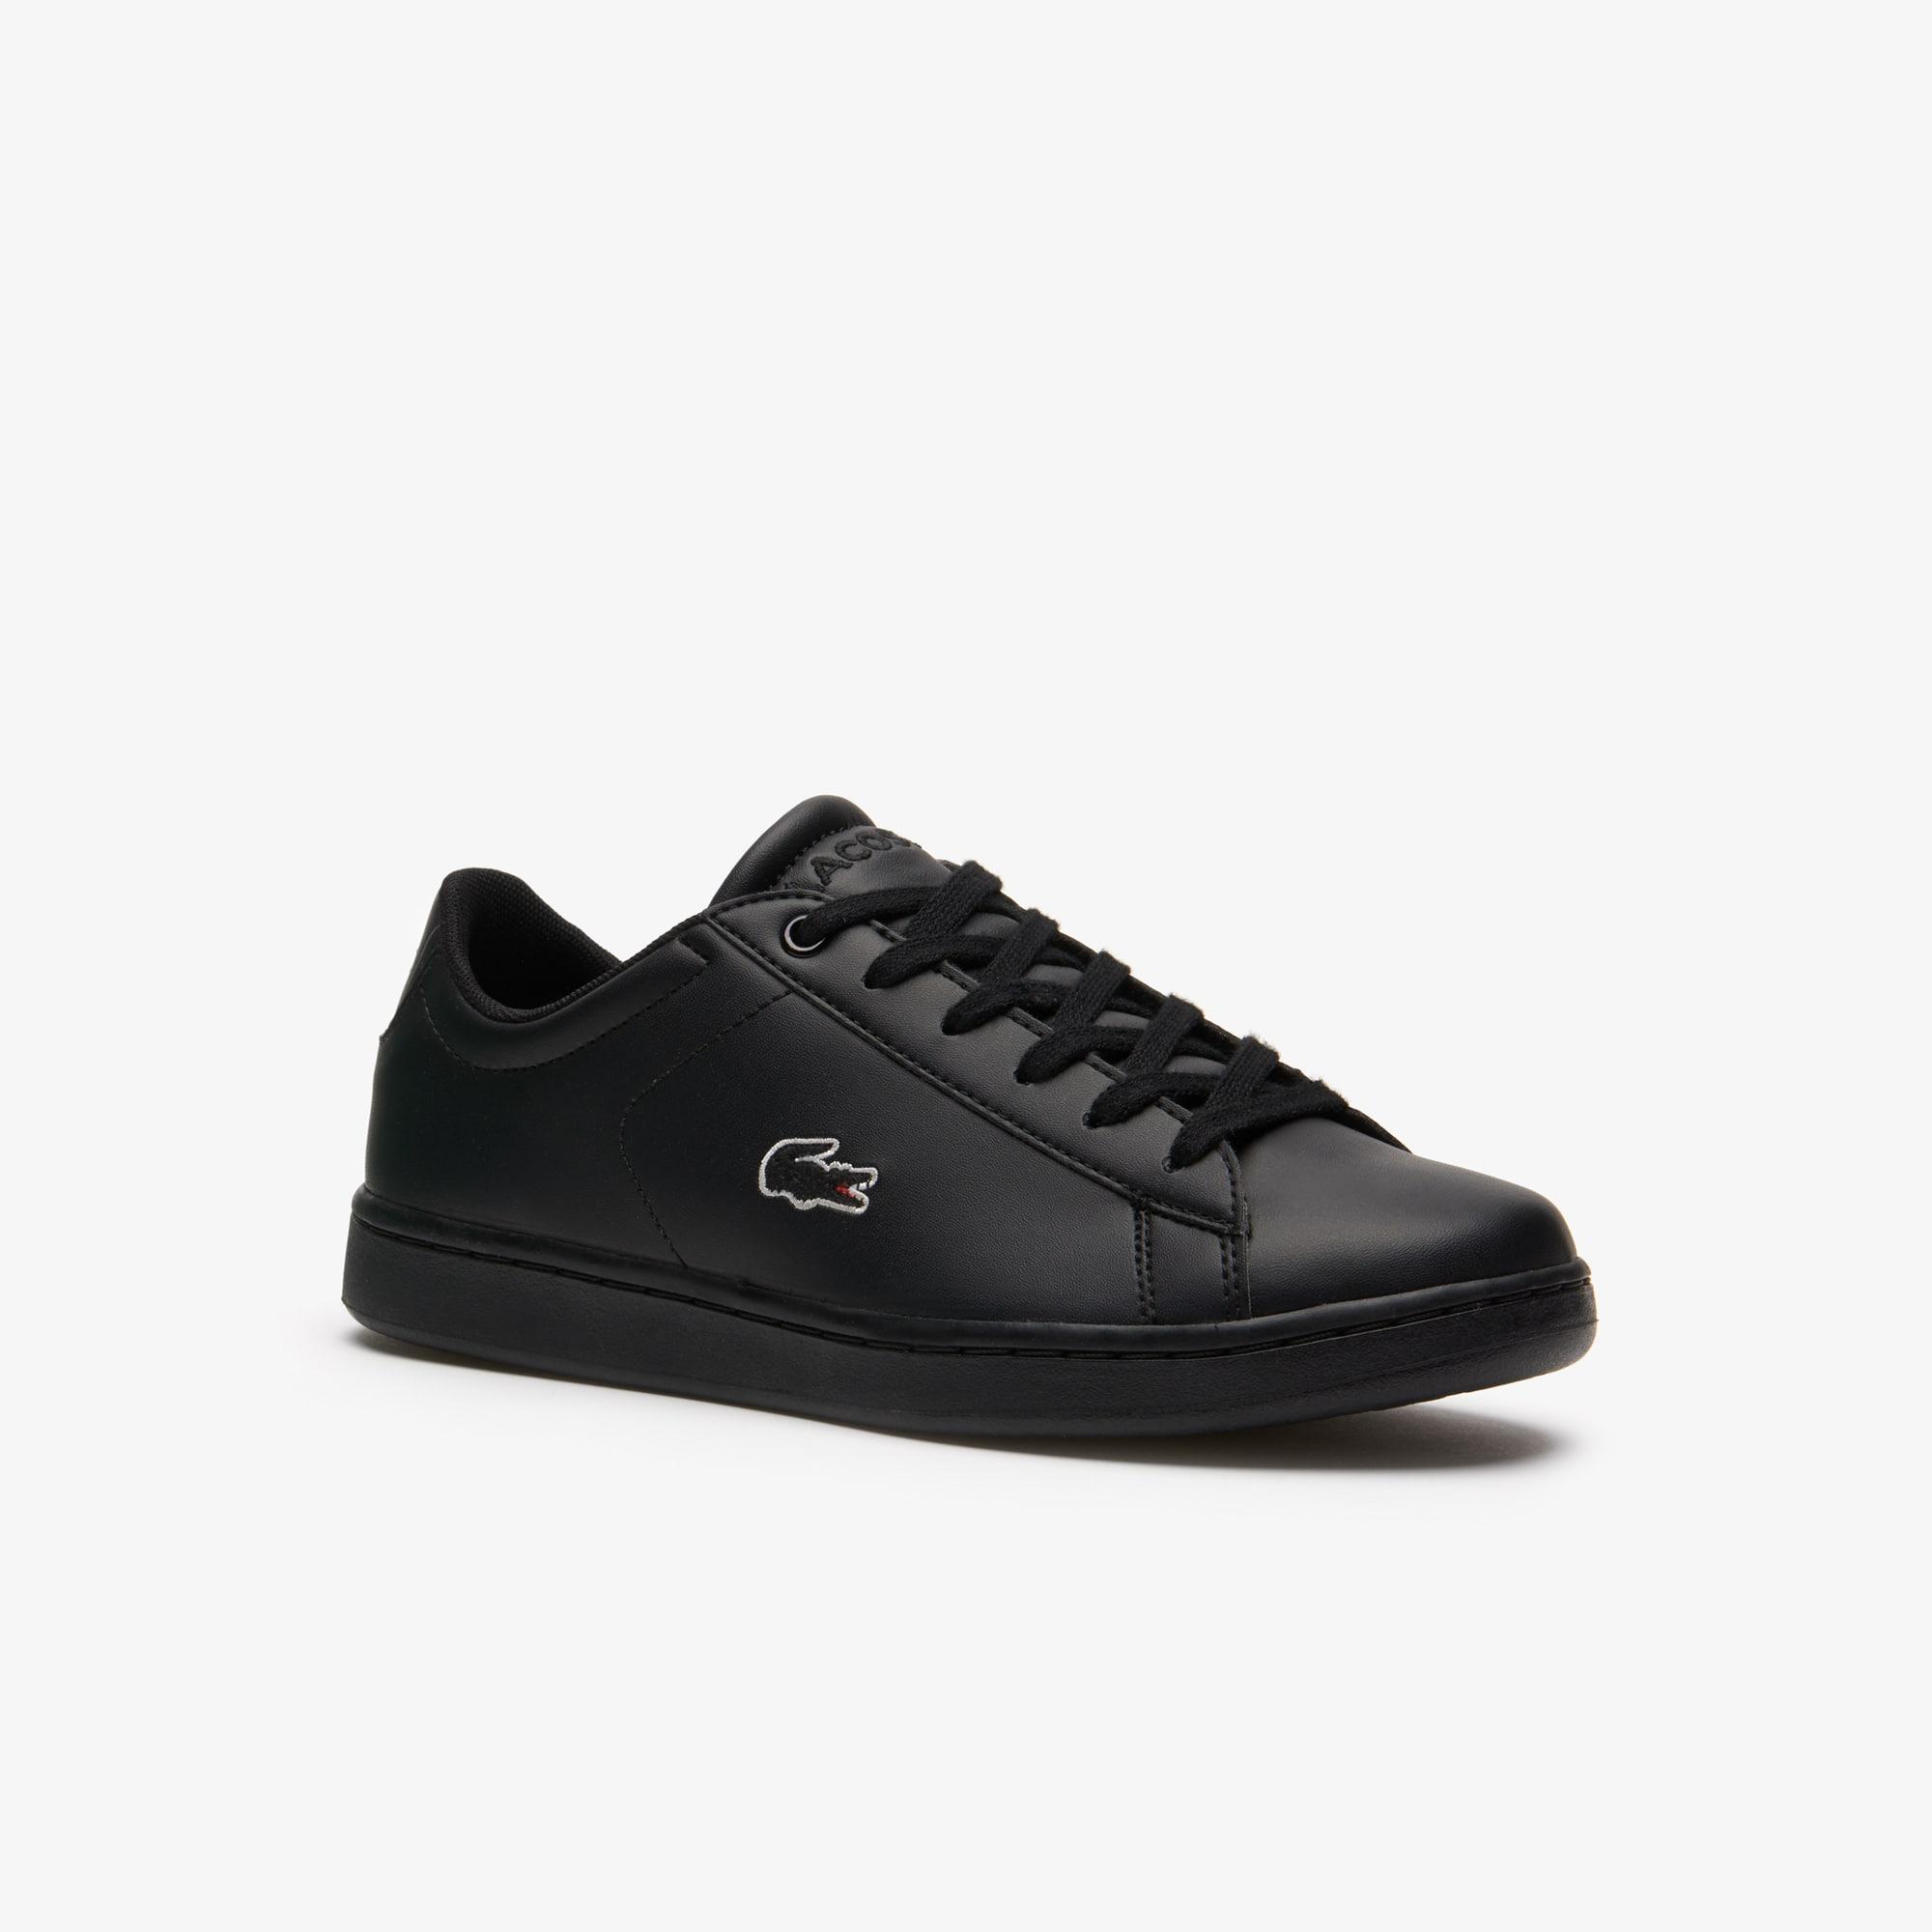 Ado   Chaussures enfant   LACOSTE af31d0fa5eb1